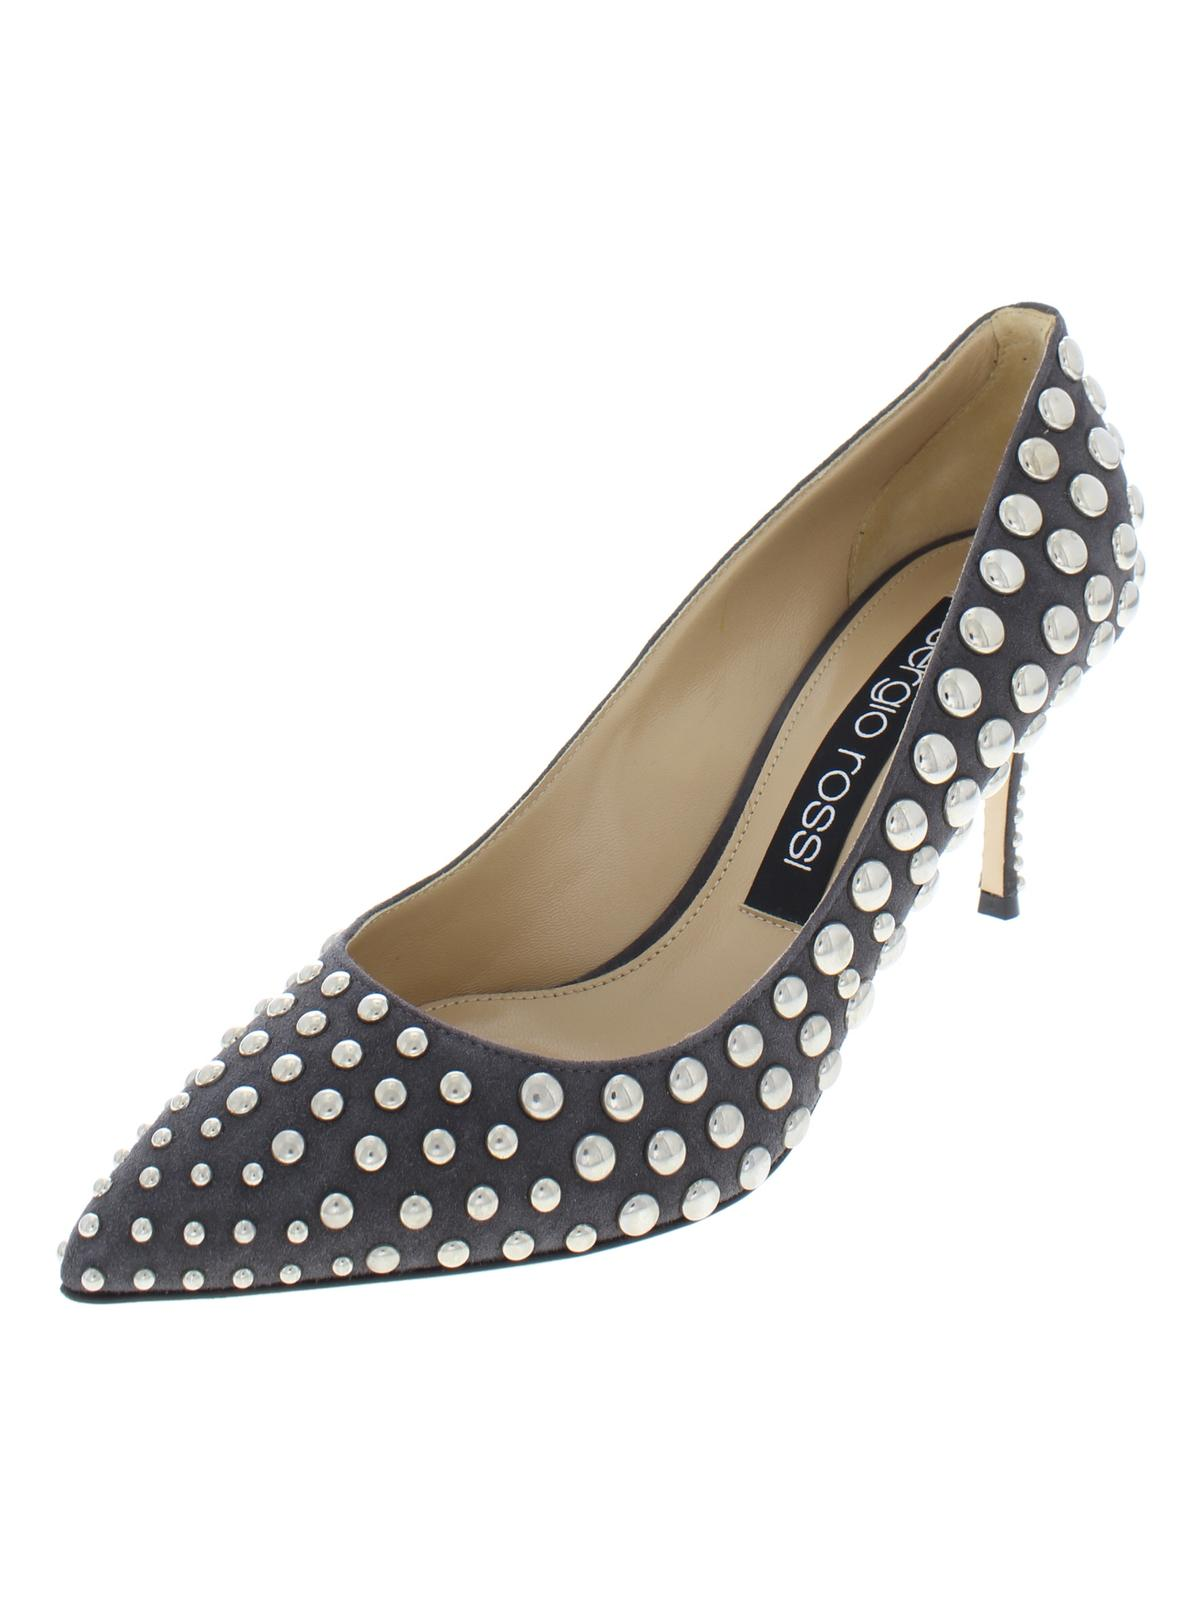 b44b087c35ac Buy Sergio Rossi Womens Godiva Suede Studded Dress Heels only ...